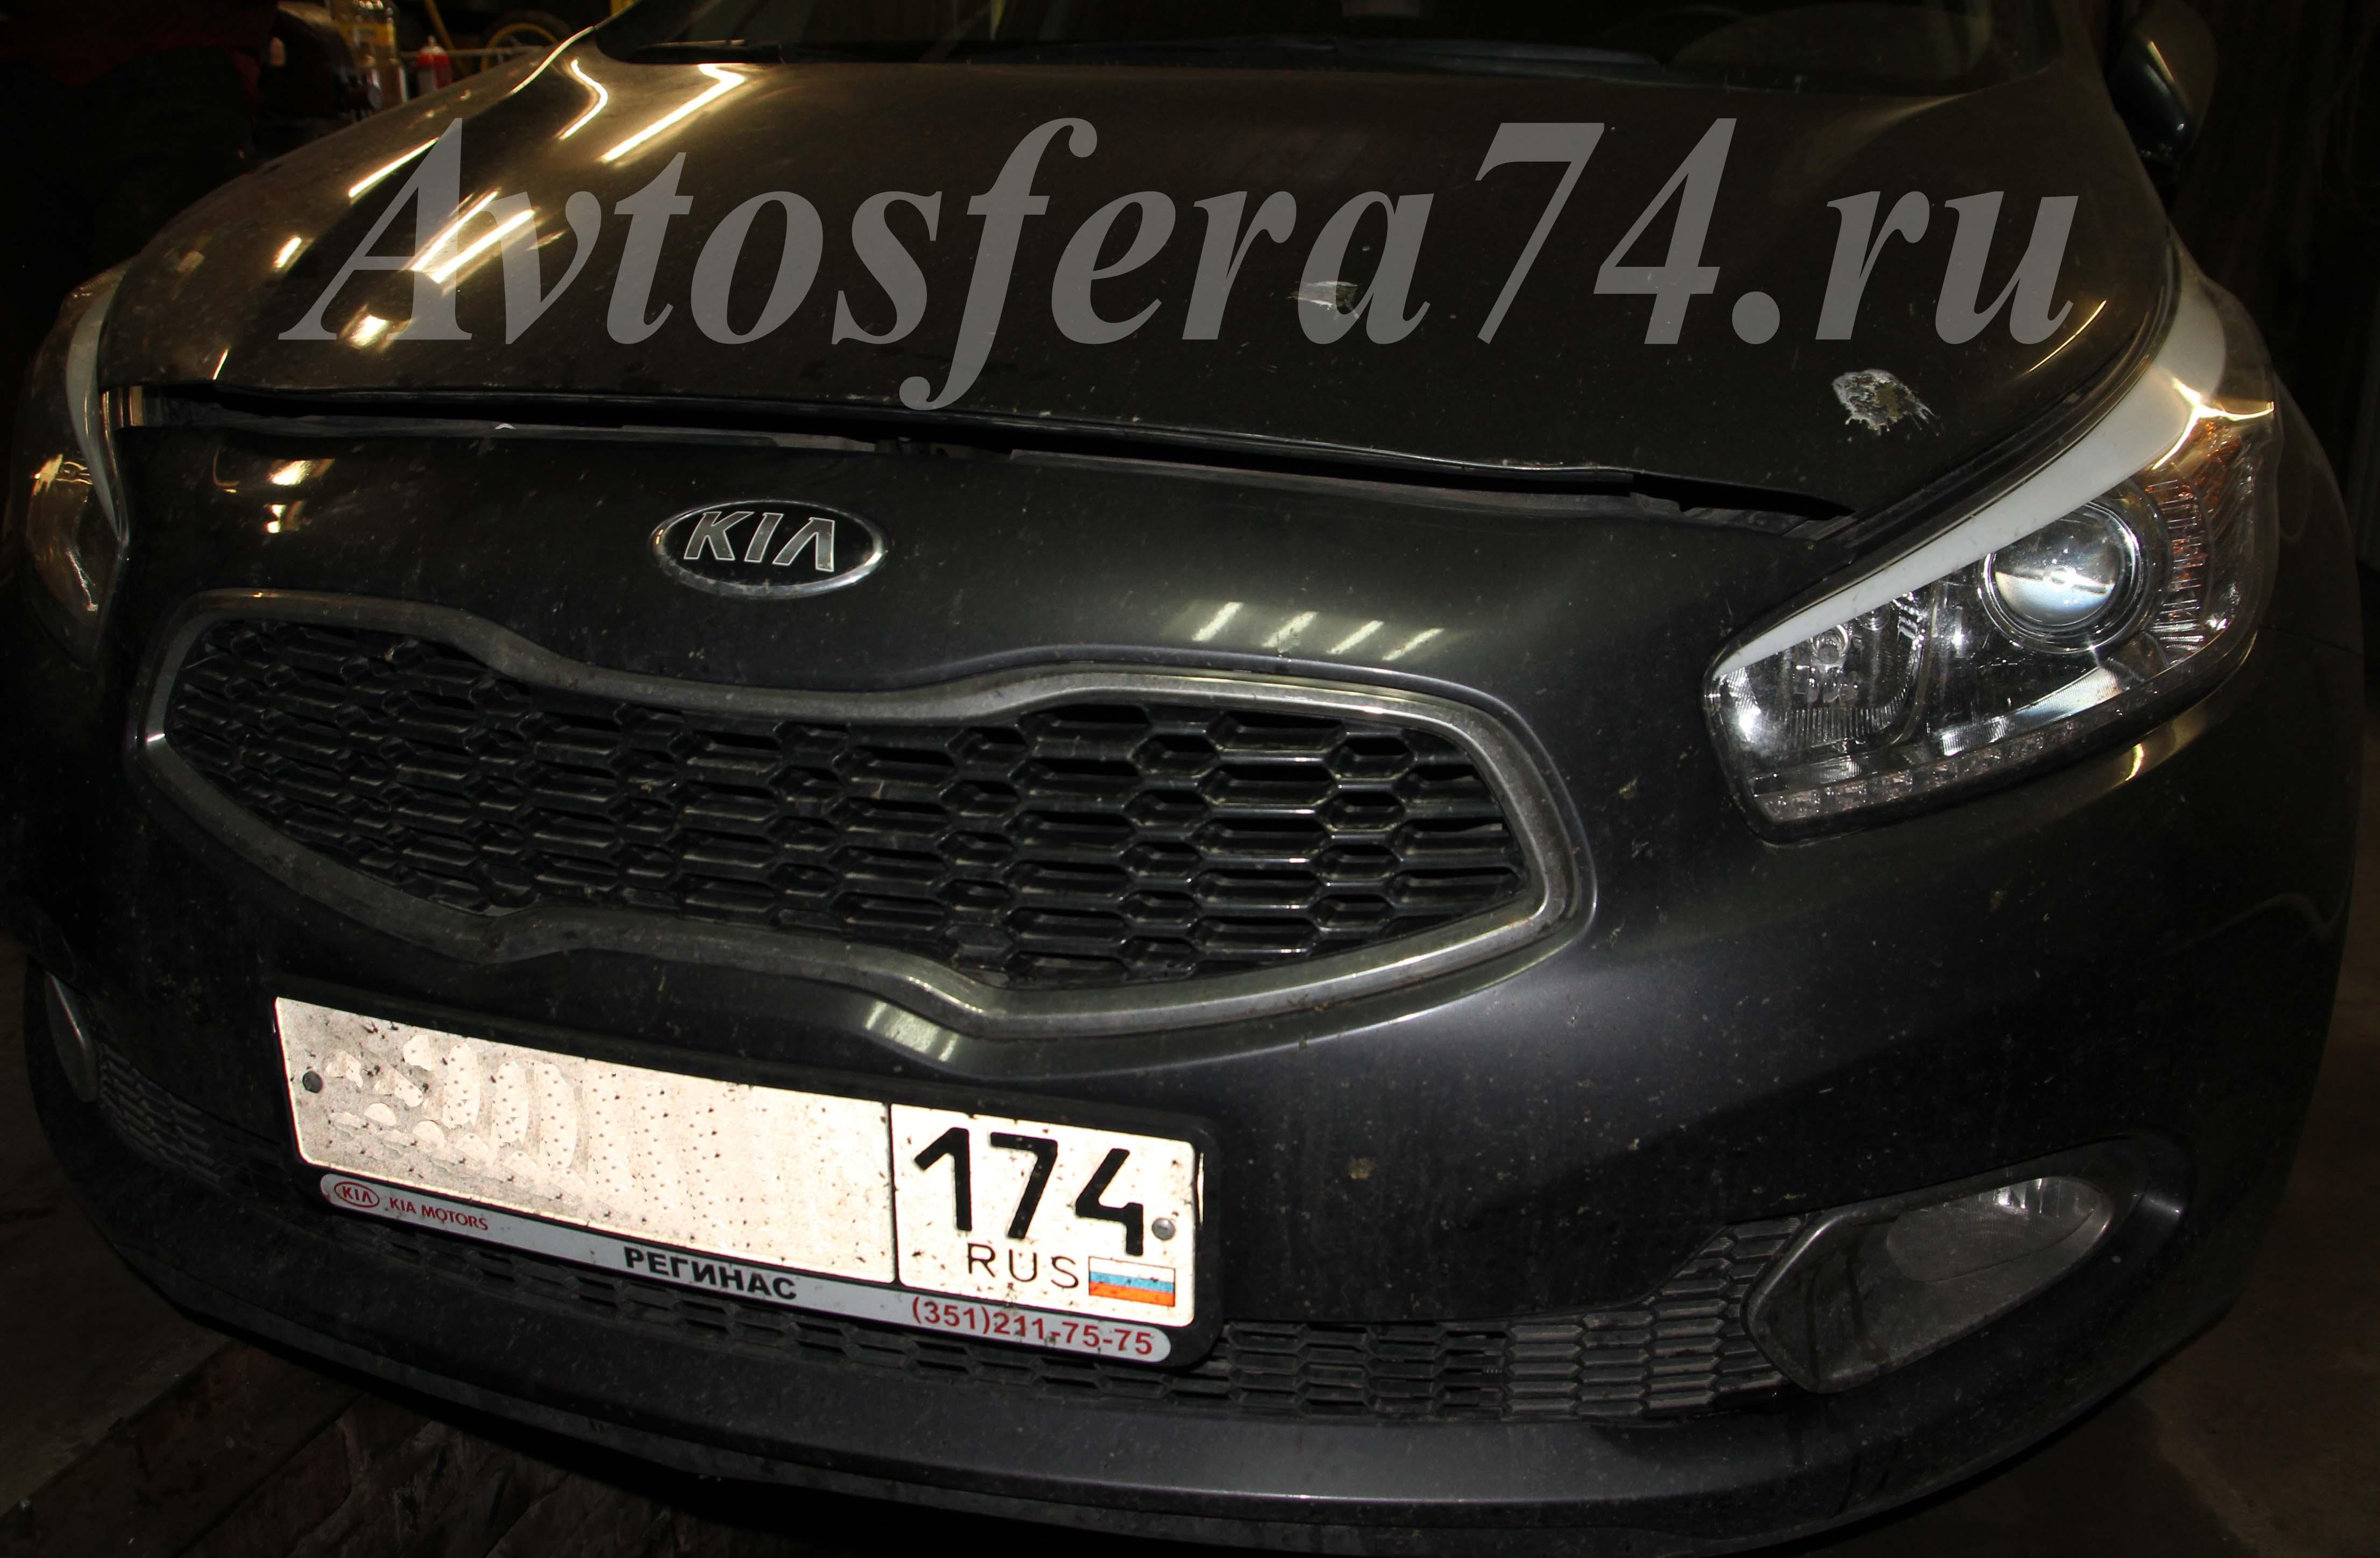 Kia cee'd 2013. Удаление катализатора и перепрошивка под евро2.